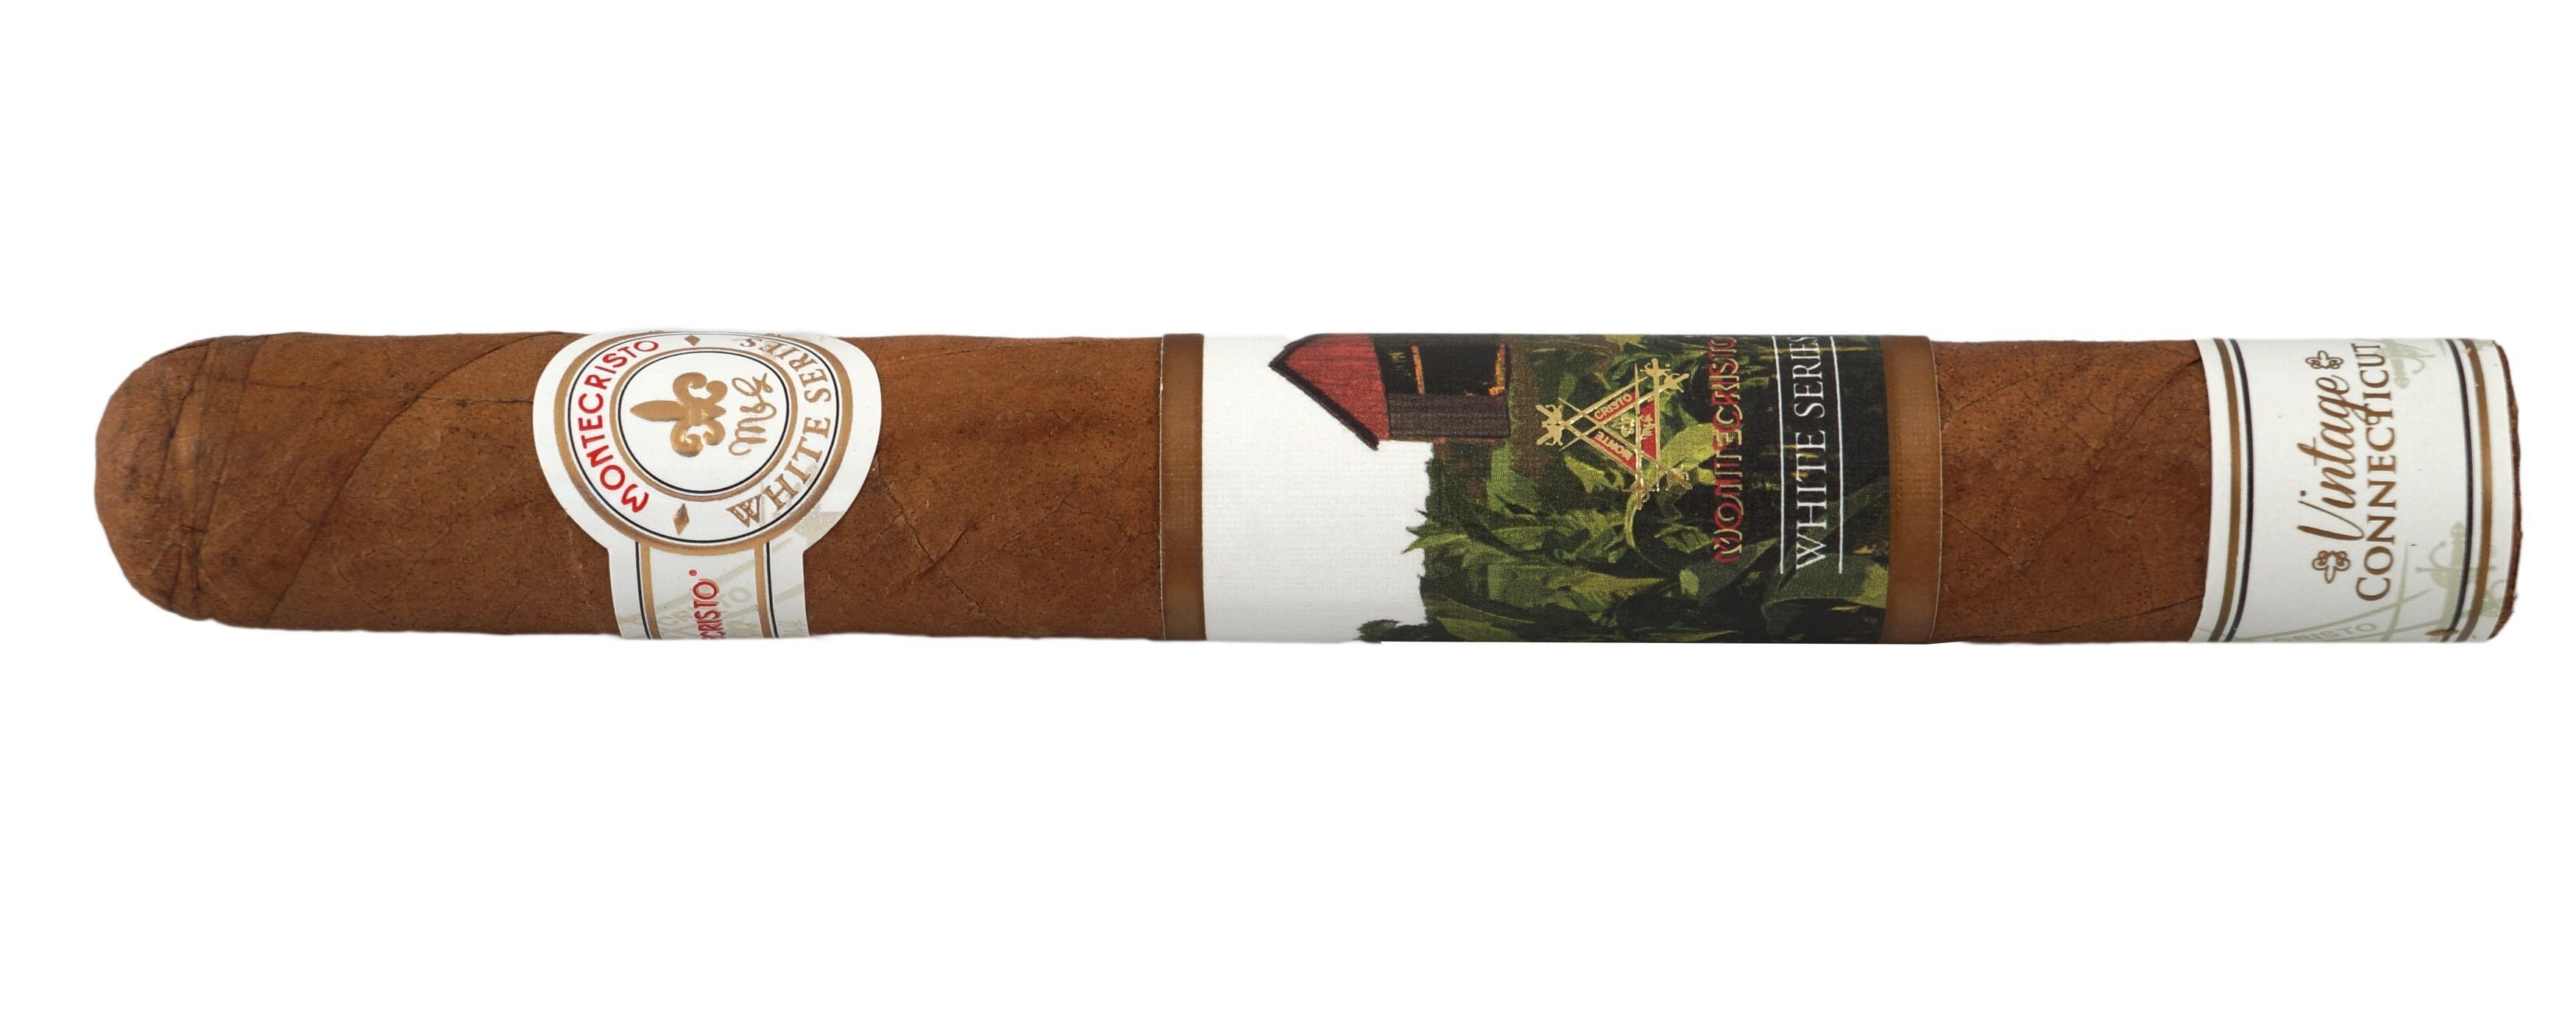 Blind Cigar Review: Montecristo | White Series Vintage Connecticut Double Corona (Pre-release)